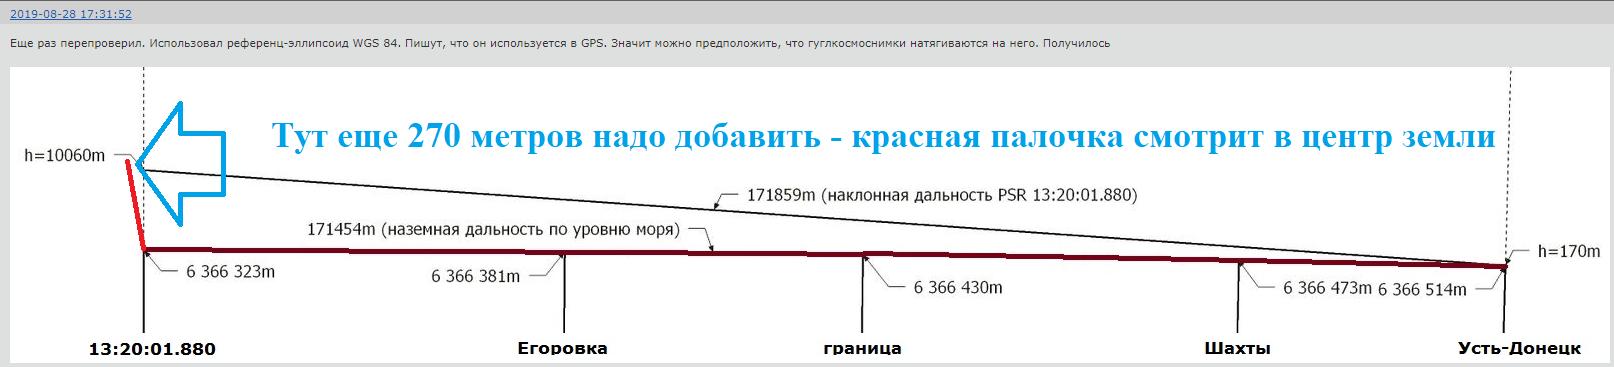 http://s3.uploads.ru/sqhpt.png